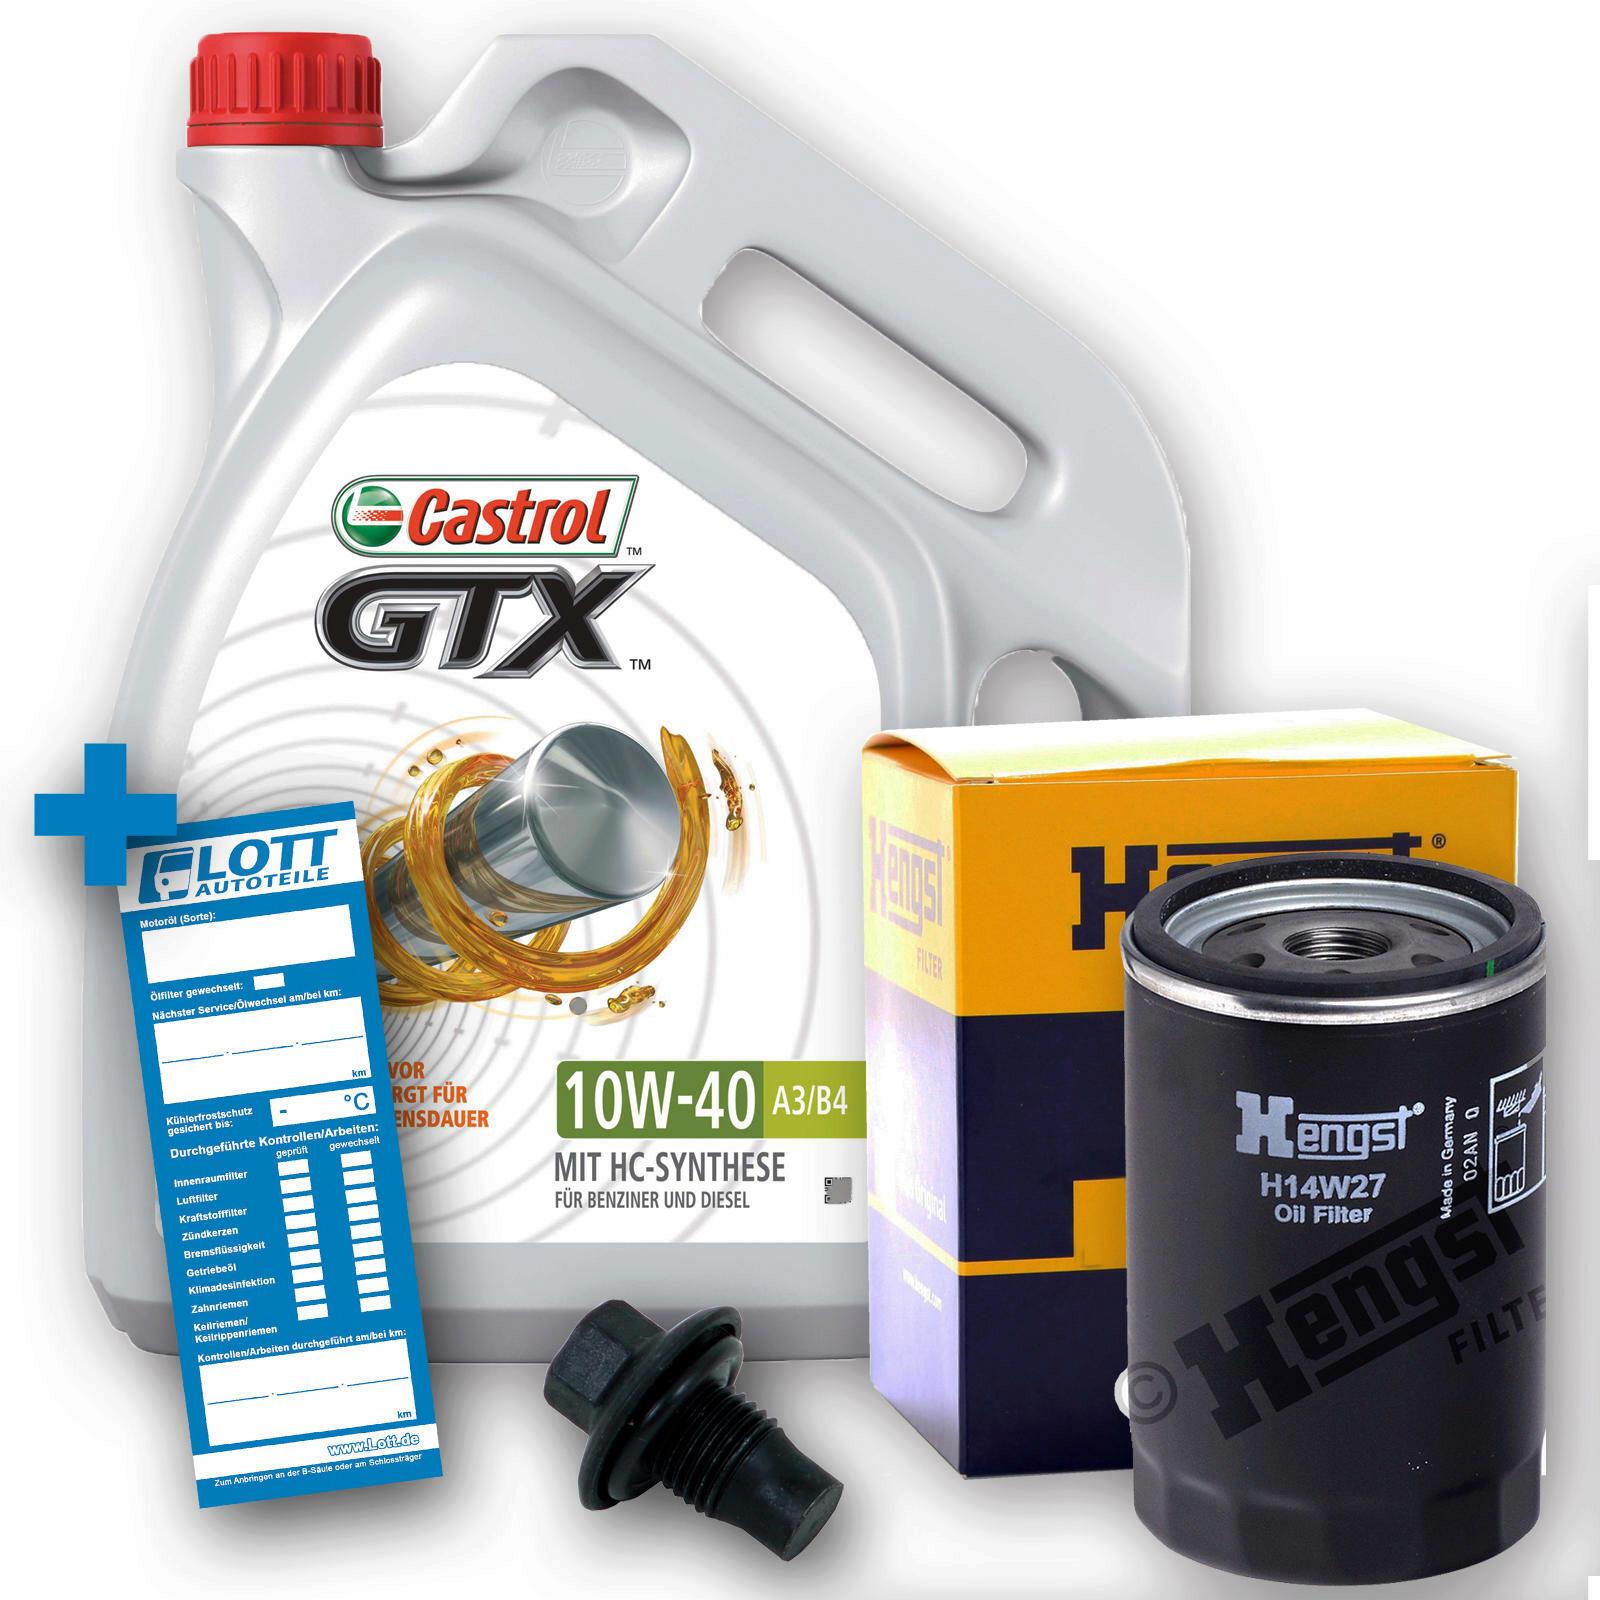 Ölwechsel Set 5L 10W40 Öl Motoröl Castrol + HENGST Ölfilter